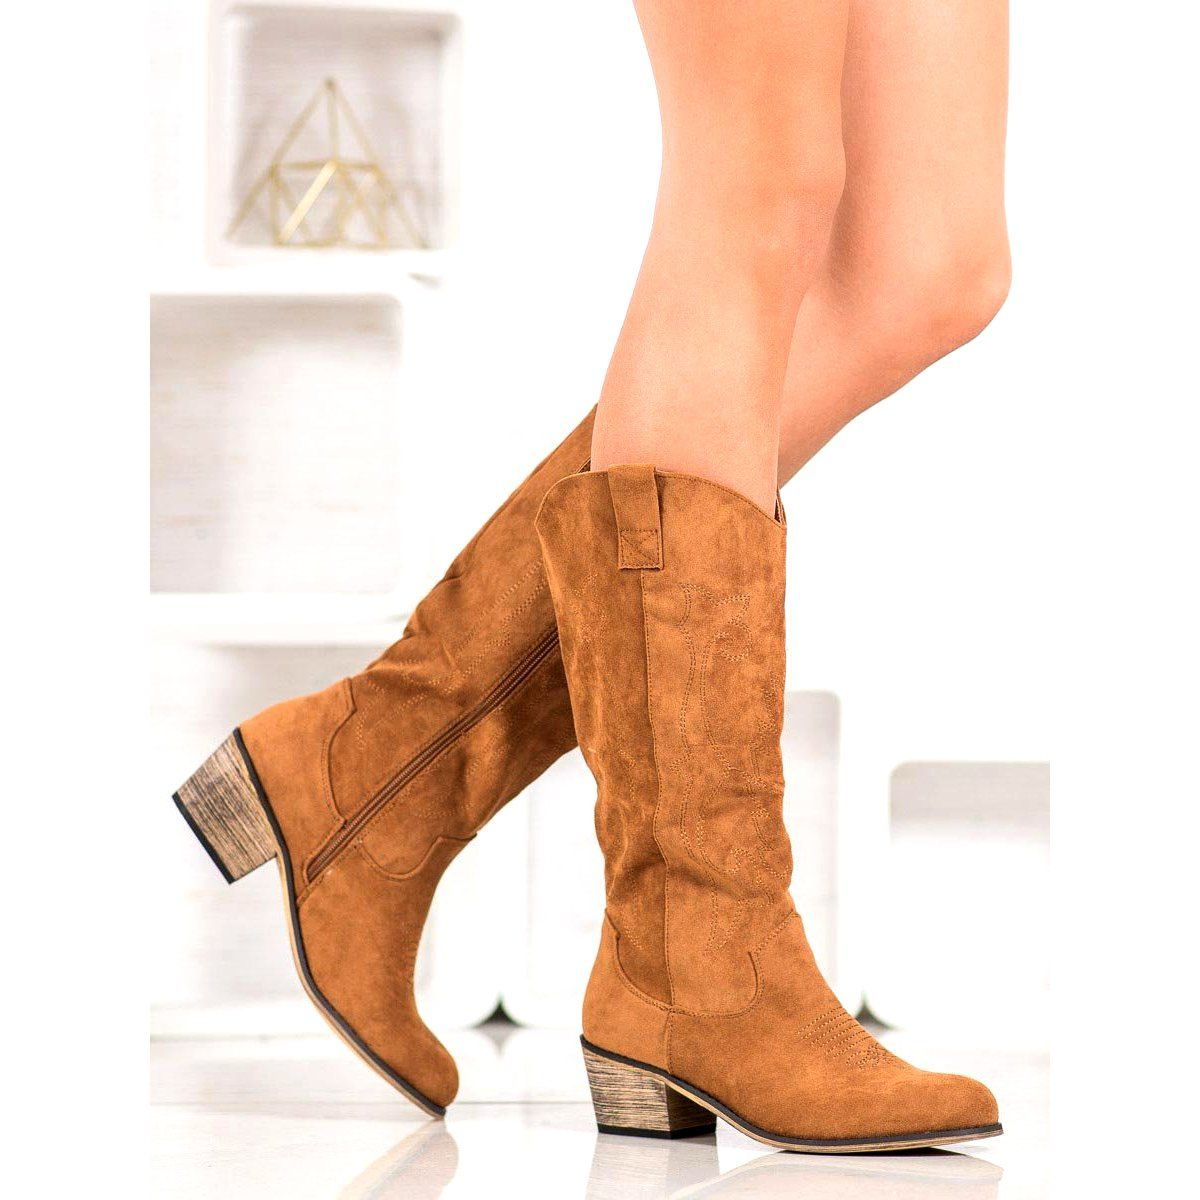 Abloom Zamszowe Kozaki Kowbojki Brazowe Ankle Boot Shoes Boots